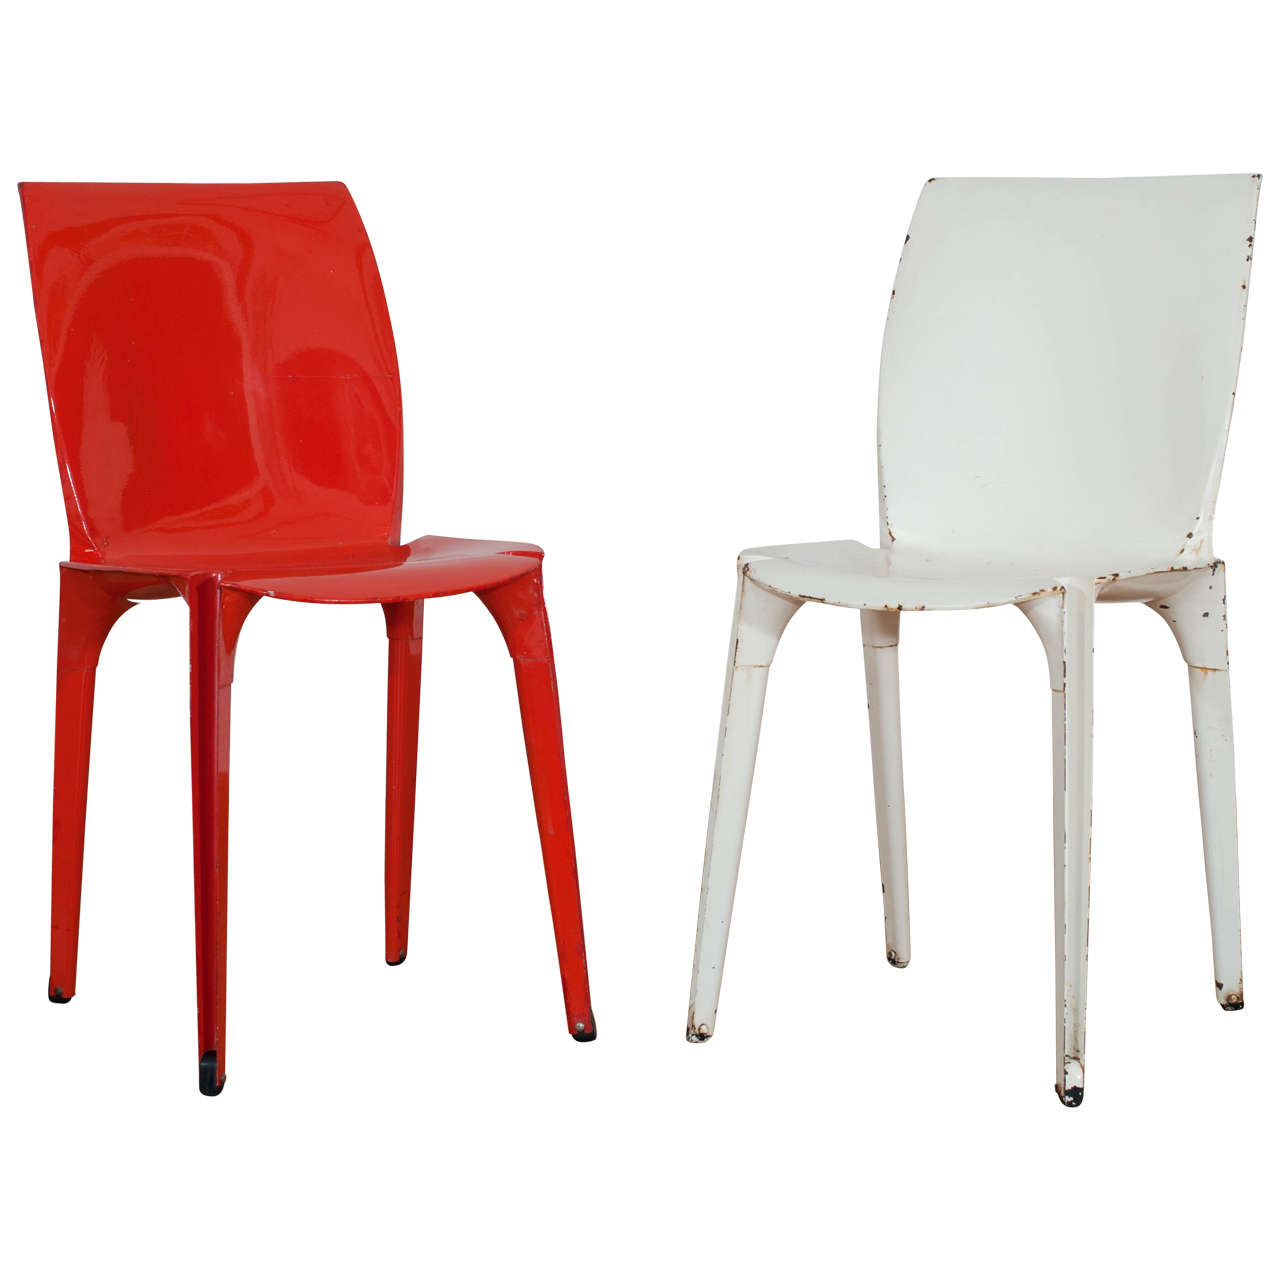 Pair of 'Lambda' Chairs Designed by Marco Zanuso for Gavina, Italy